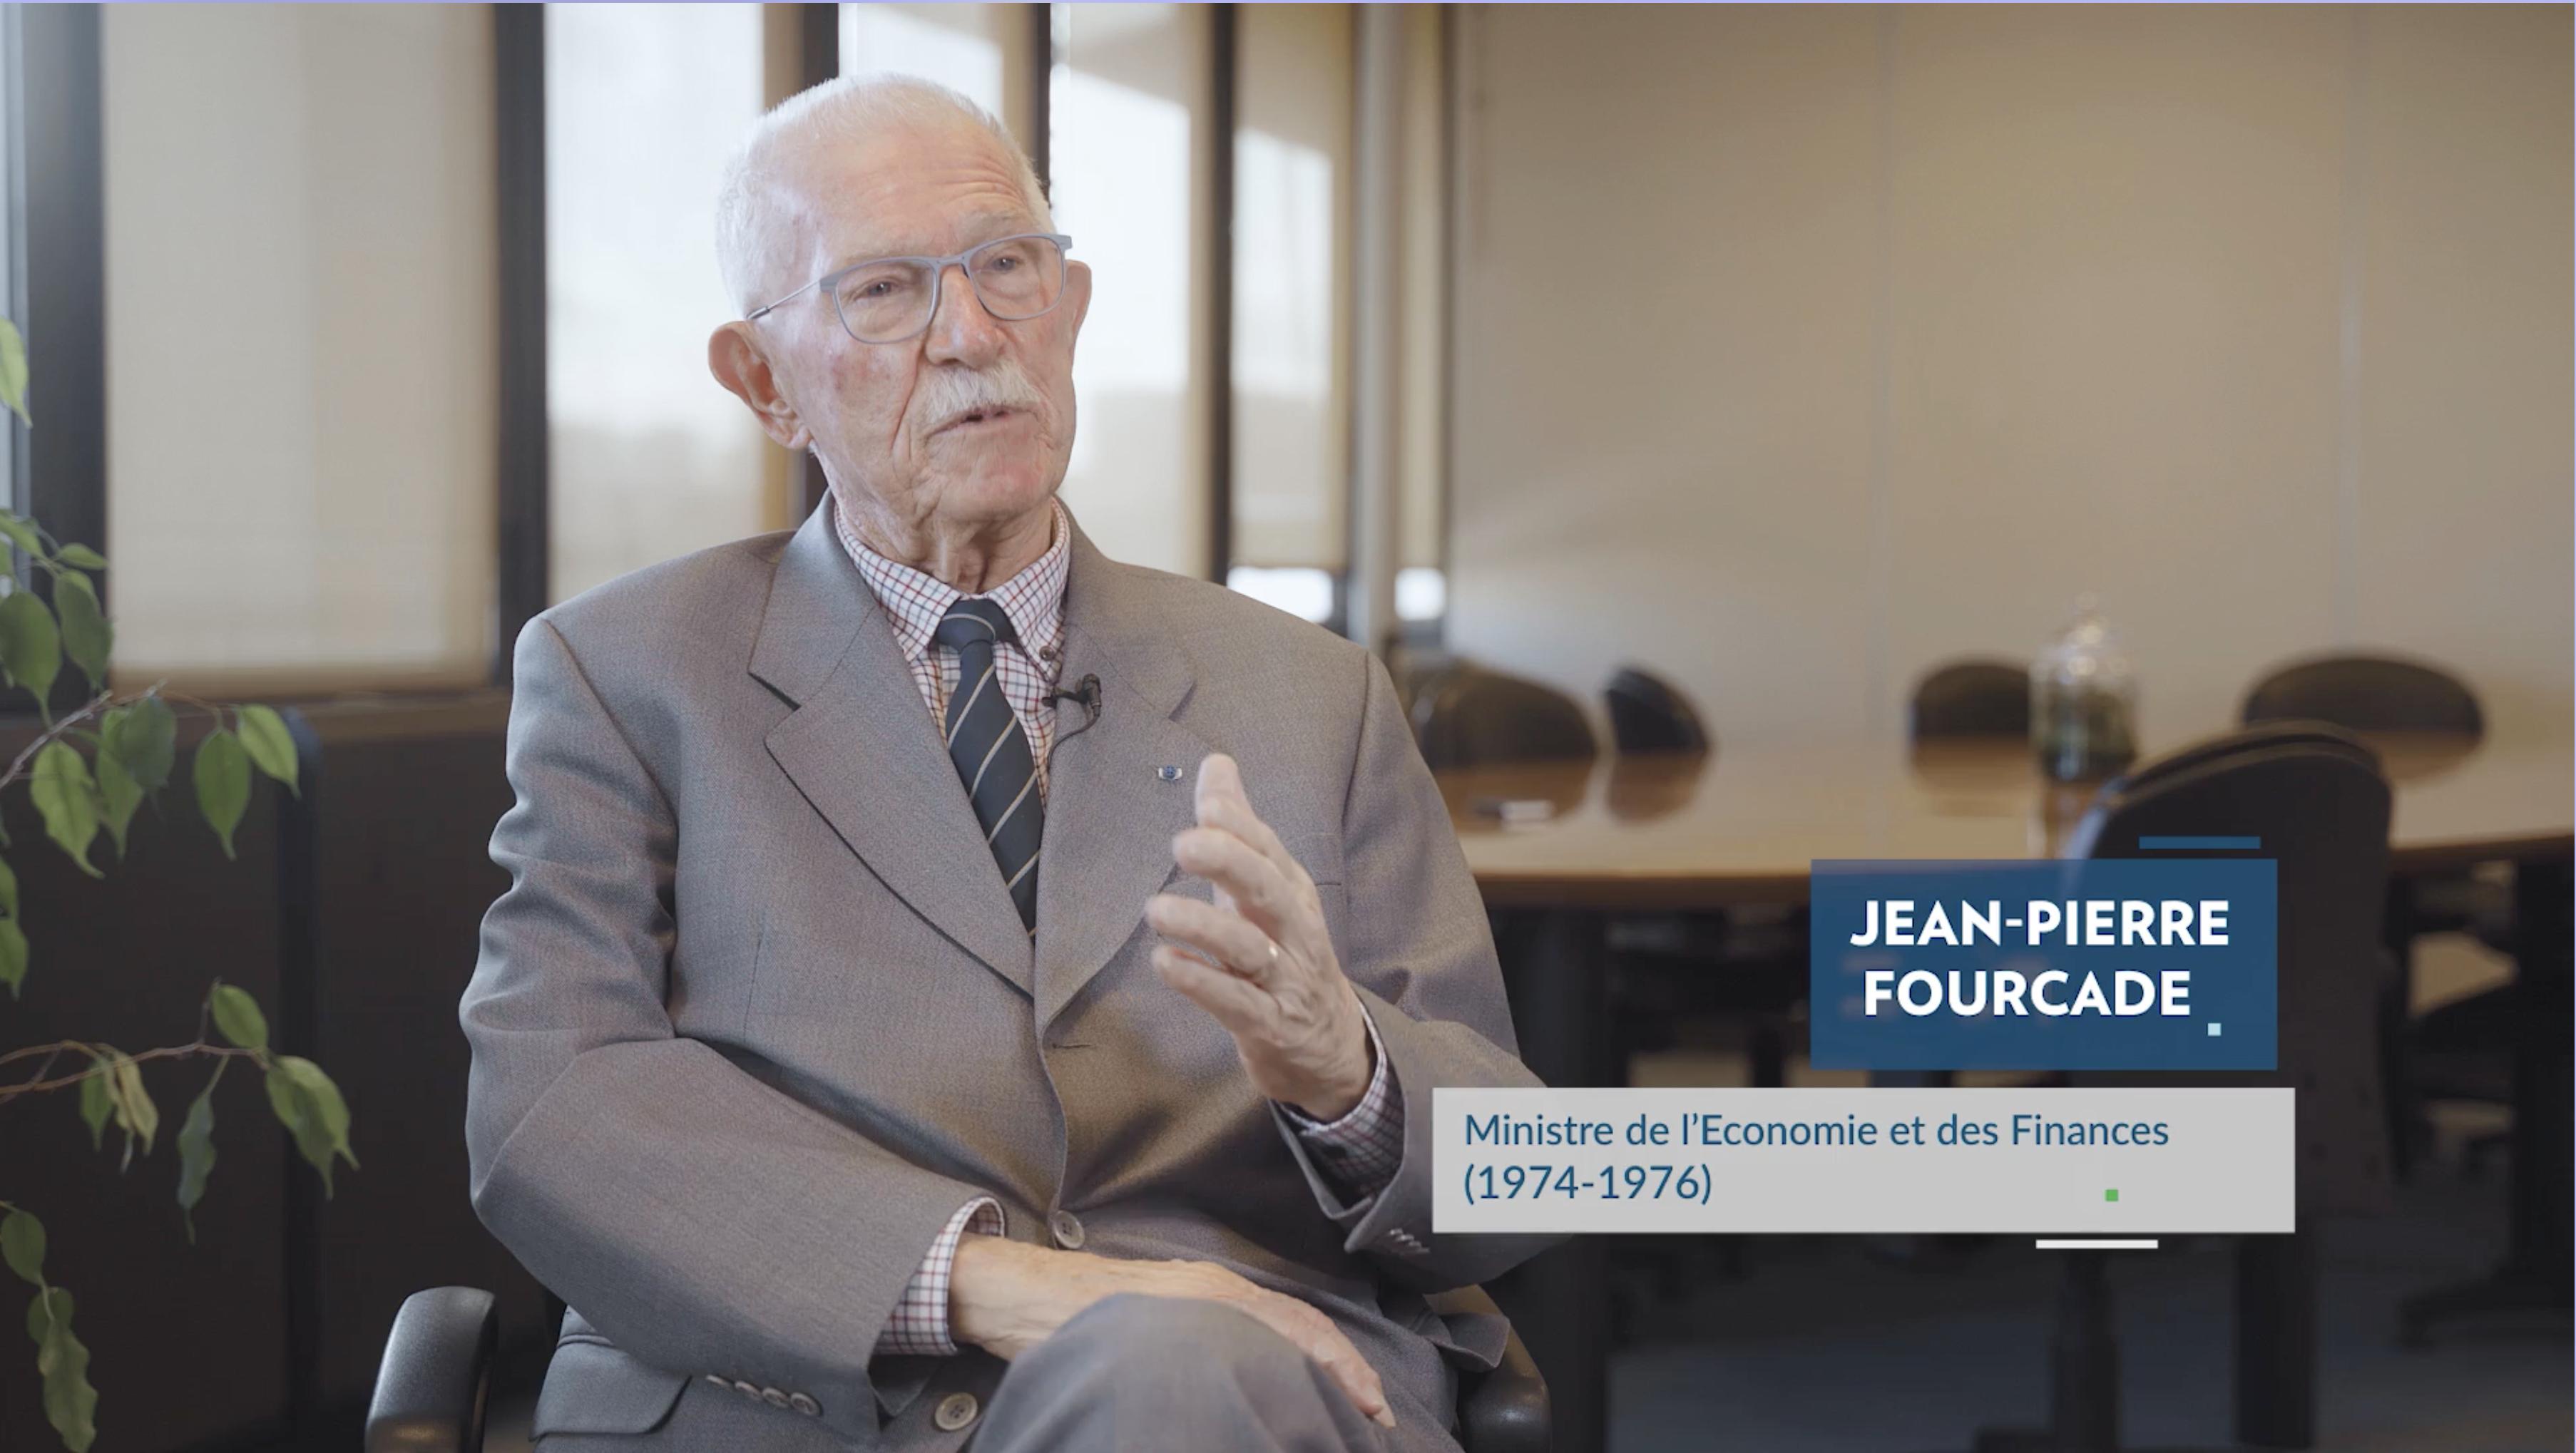 Jean-Pierre Fourcade